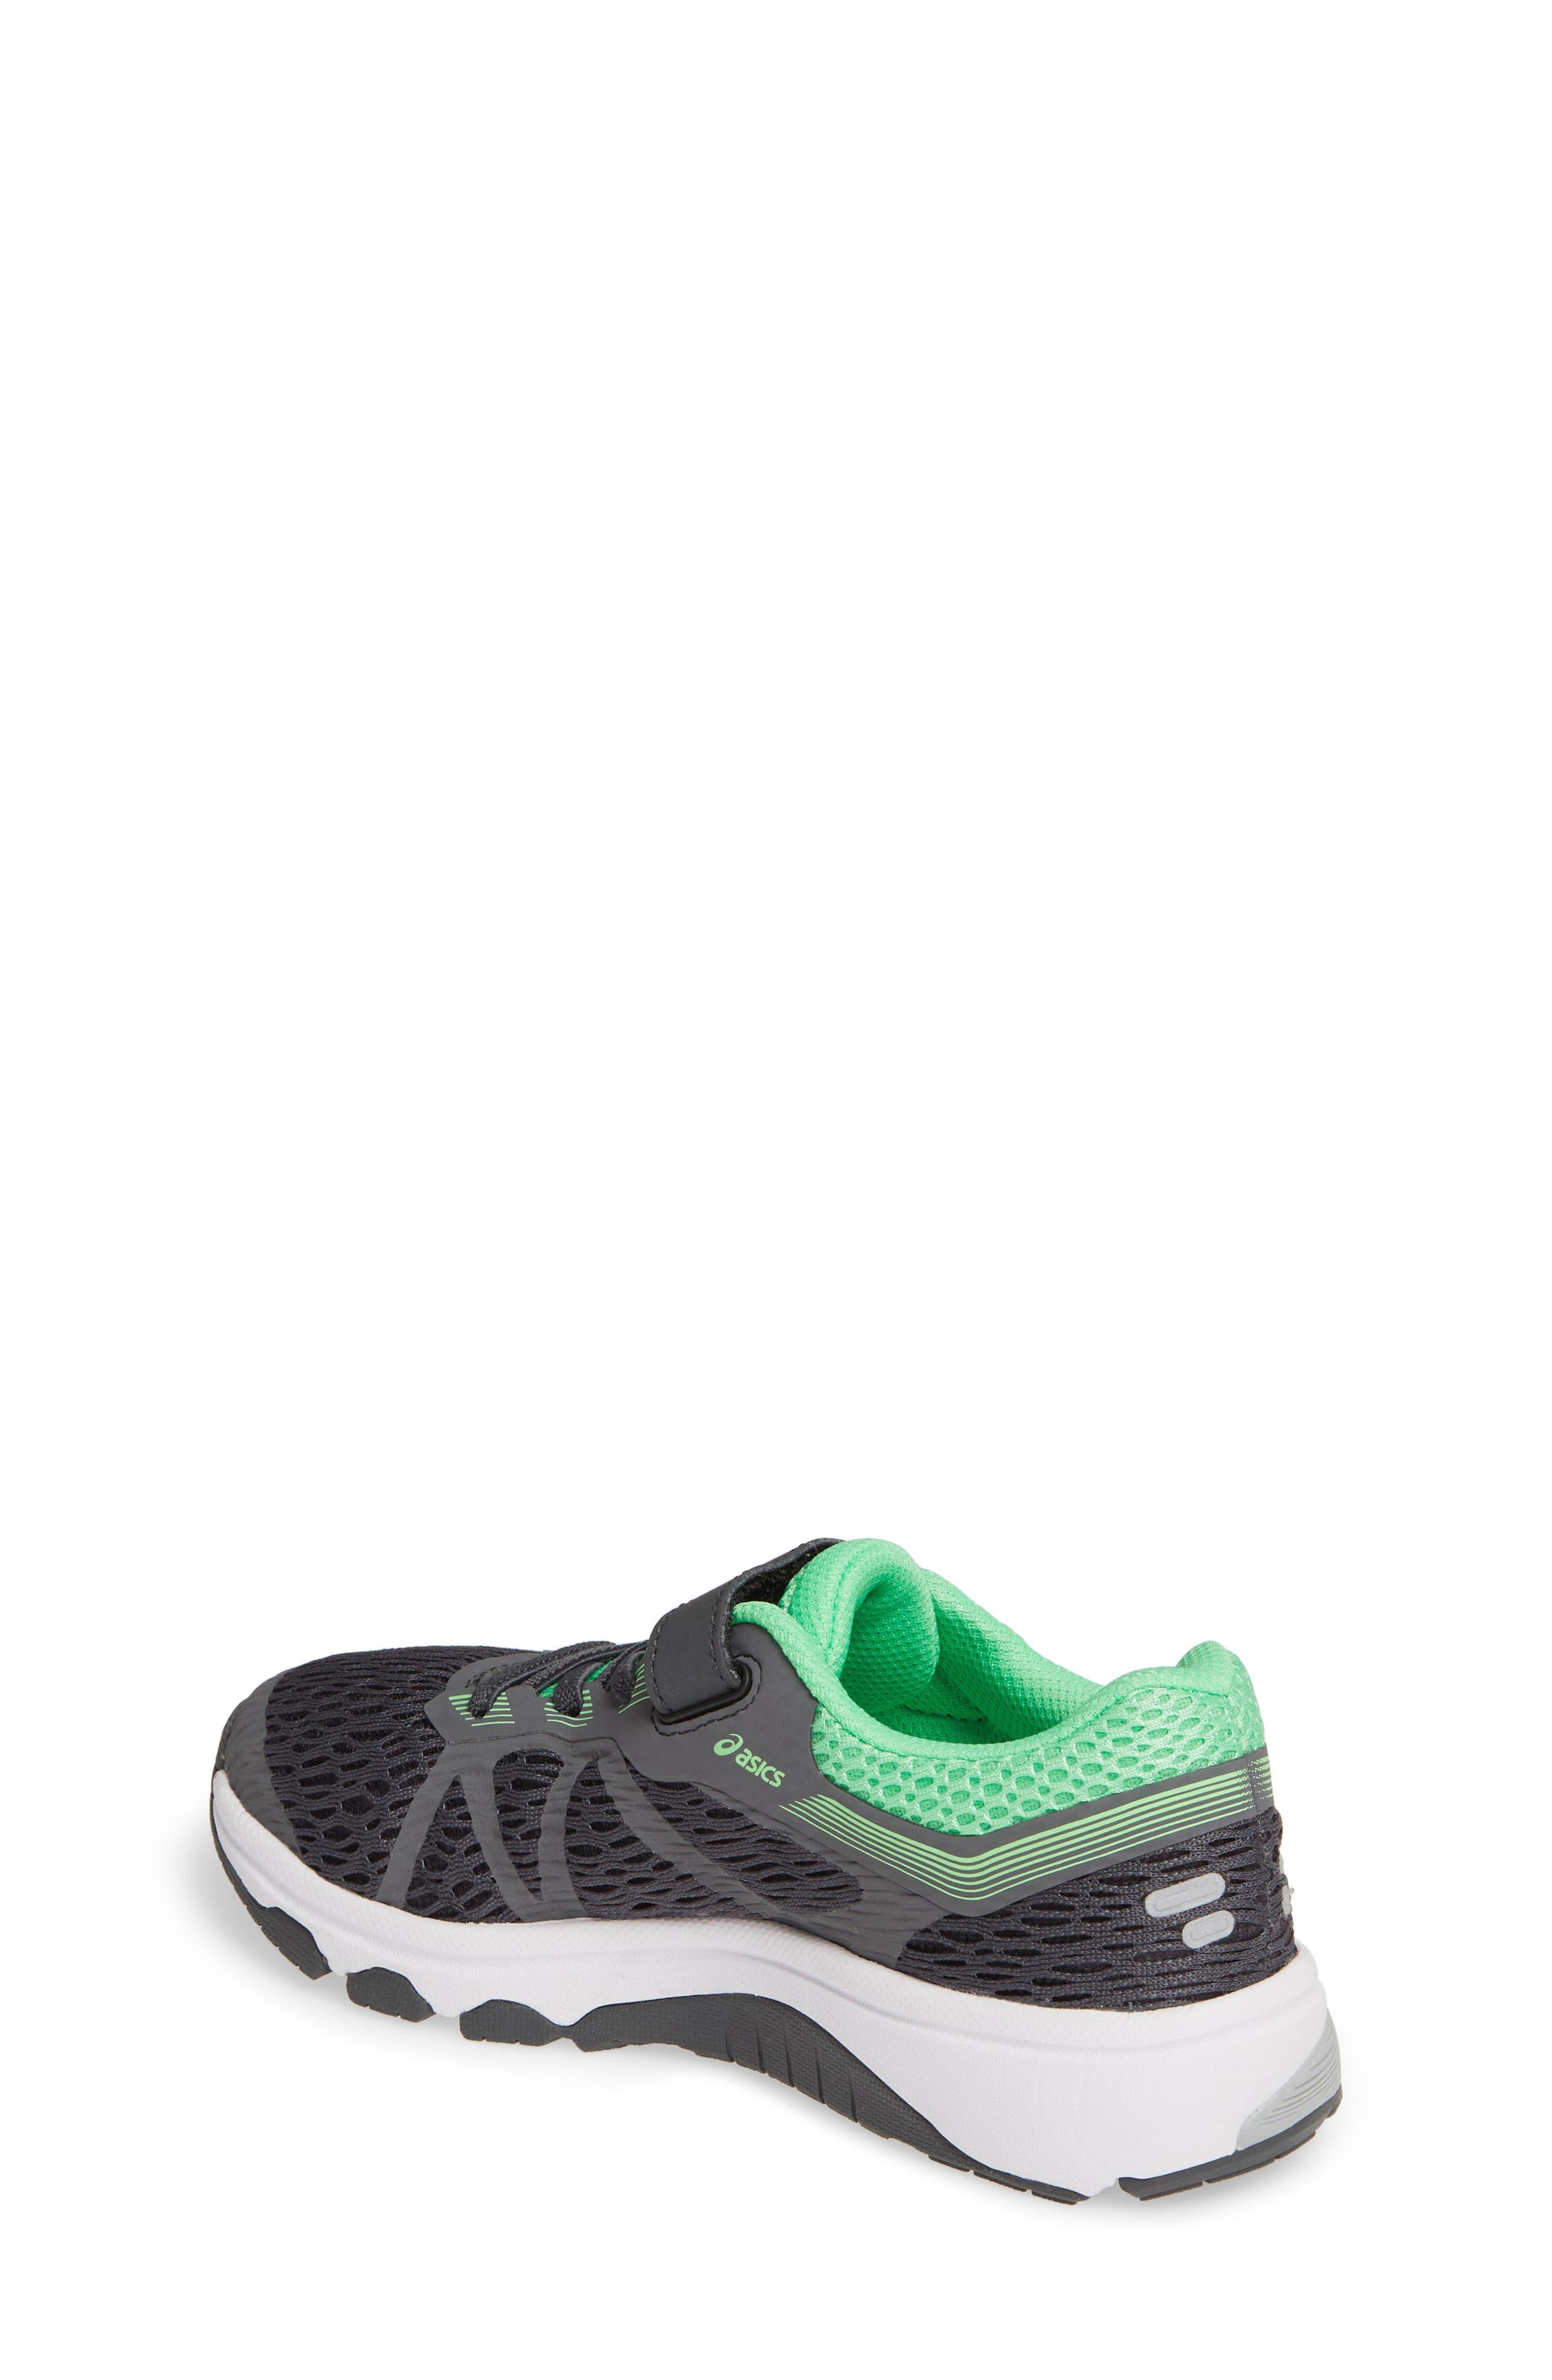 ASICS<SUP>®</SUP>, GT 1000 7 Running Shoe, Alternate thumbnail 2, color, DARK GREY/ DARK GREY